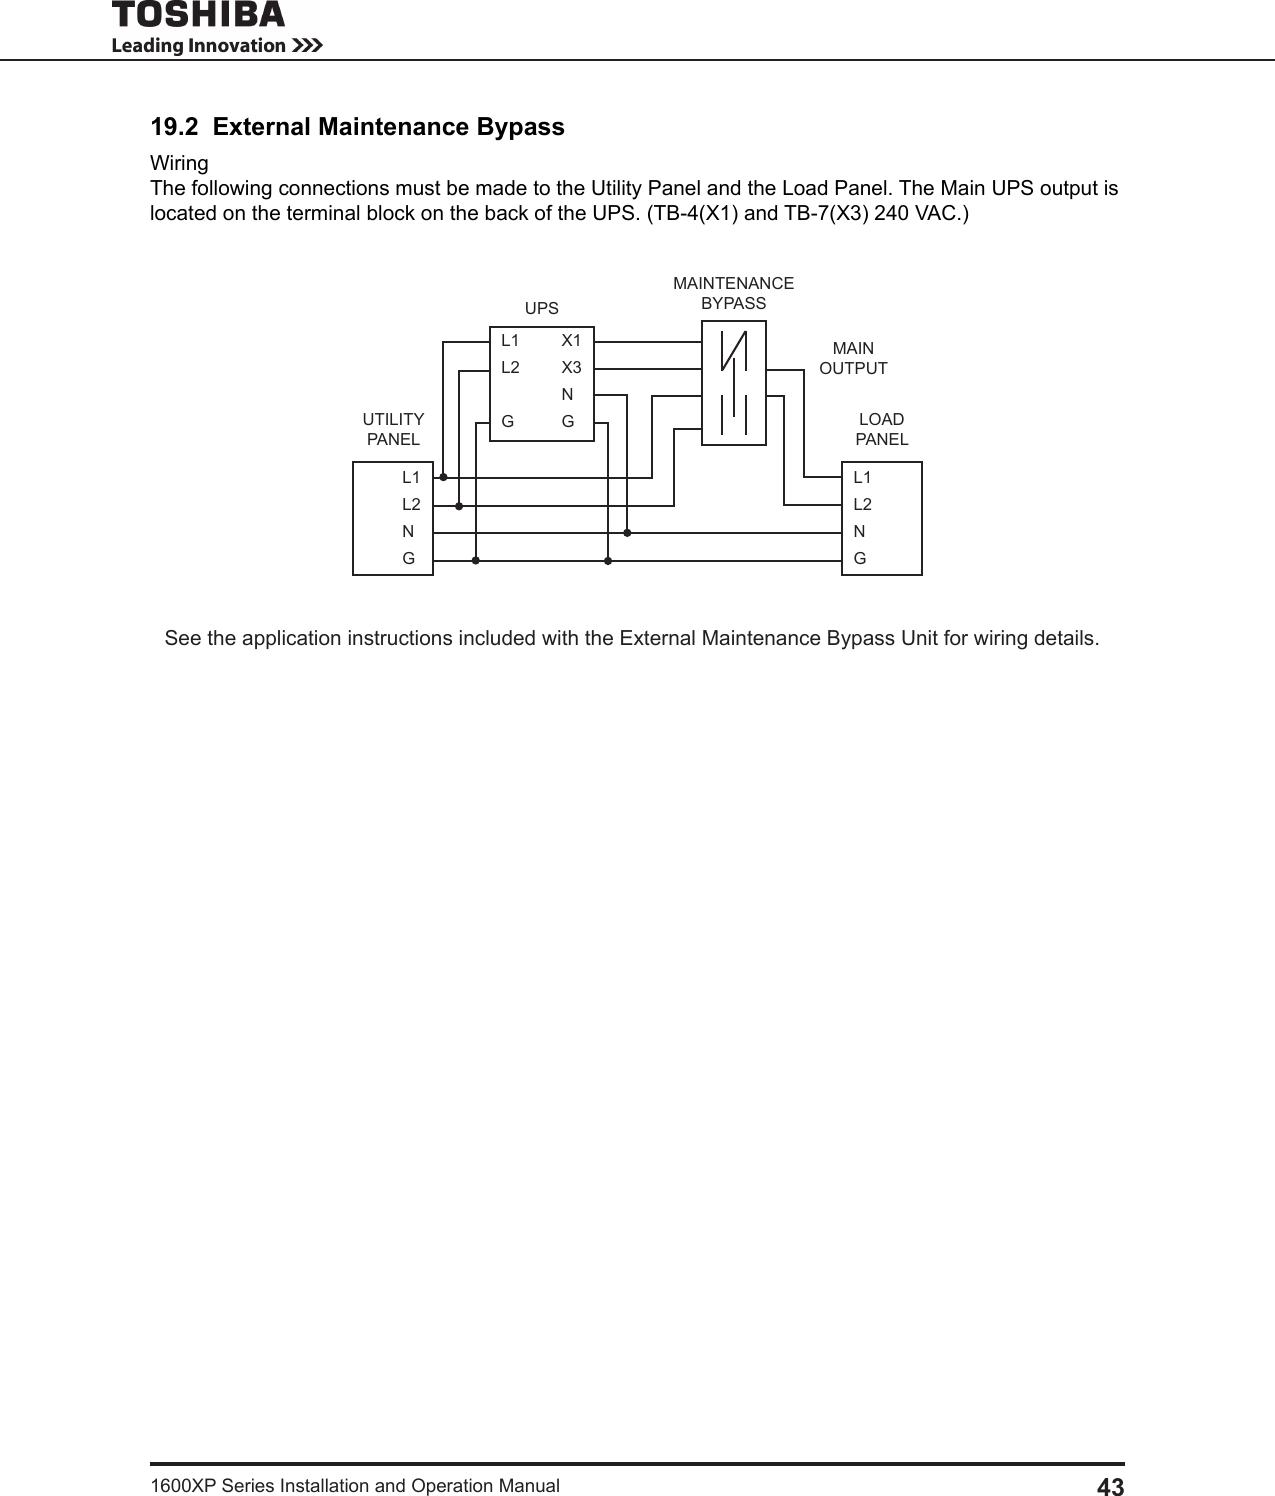 Toshiba 1600 Xp Wiring Diagram - Wiring Diagram Source on